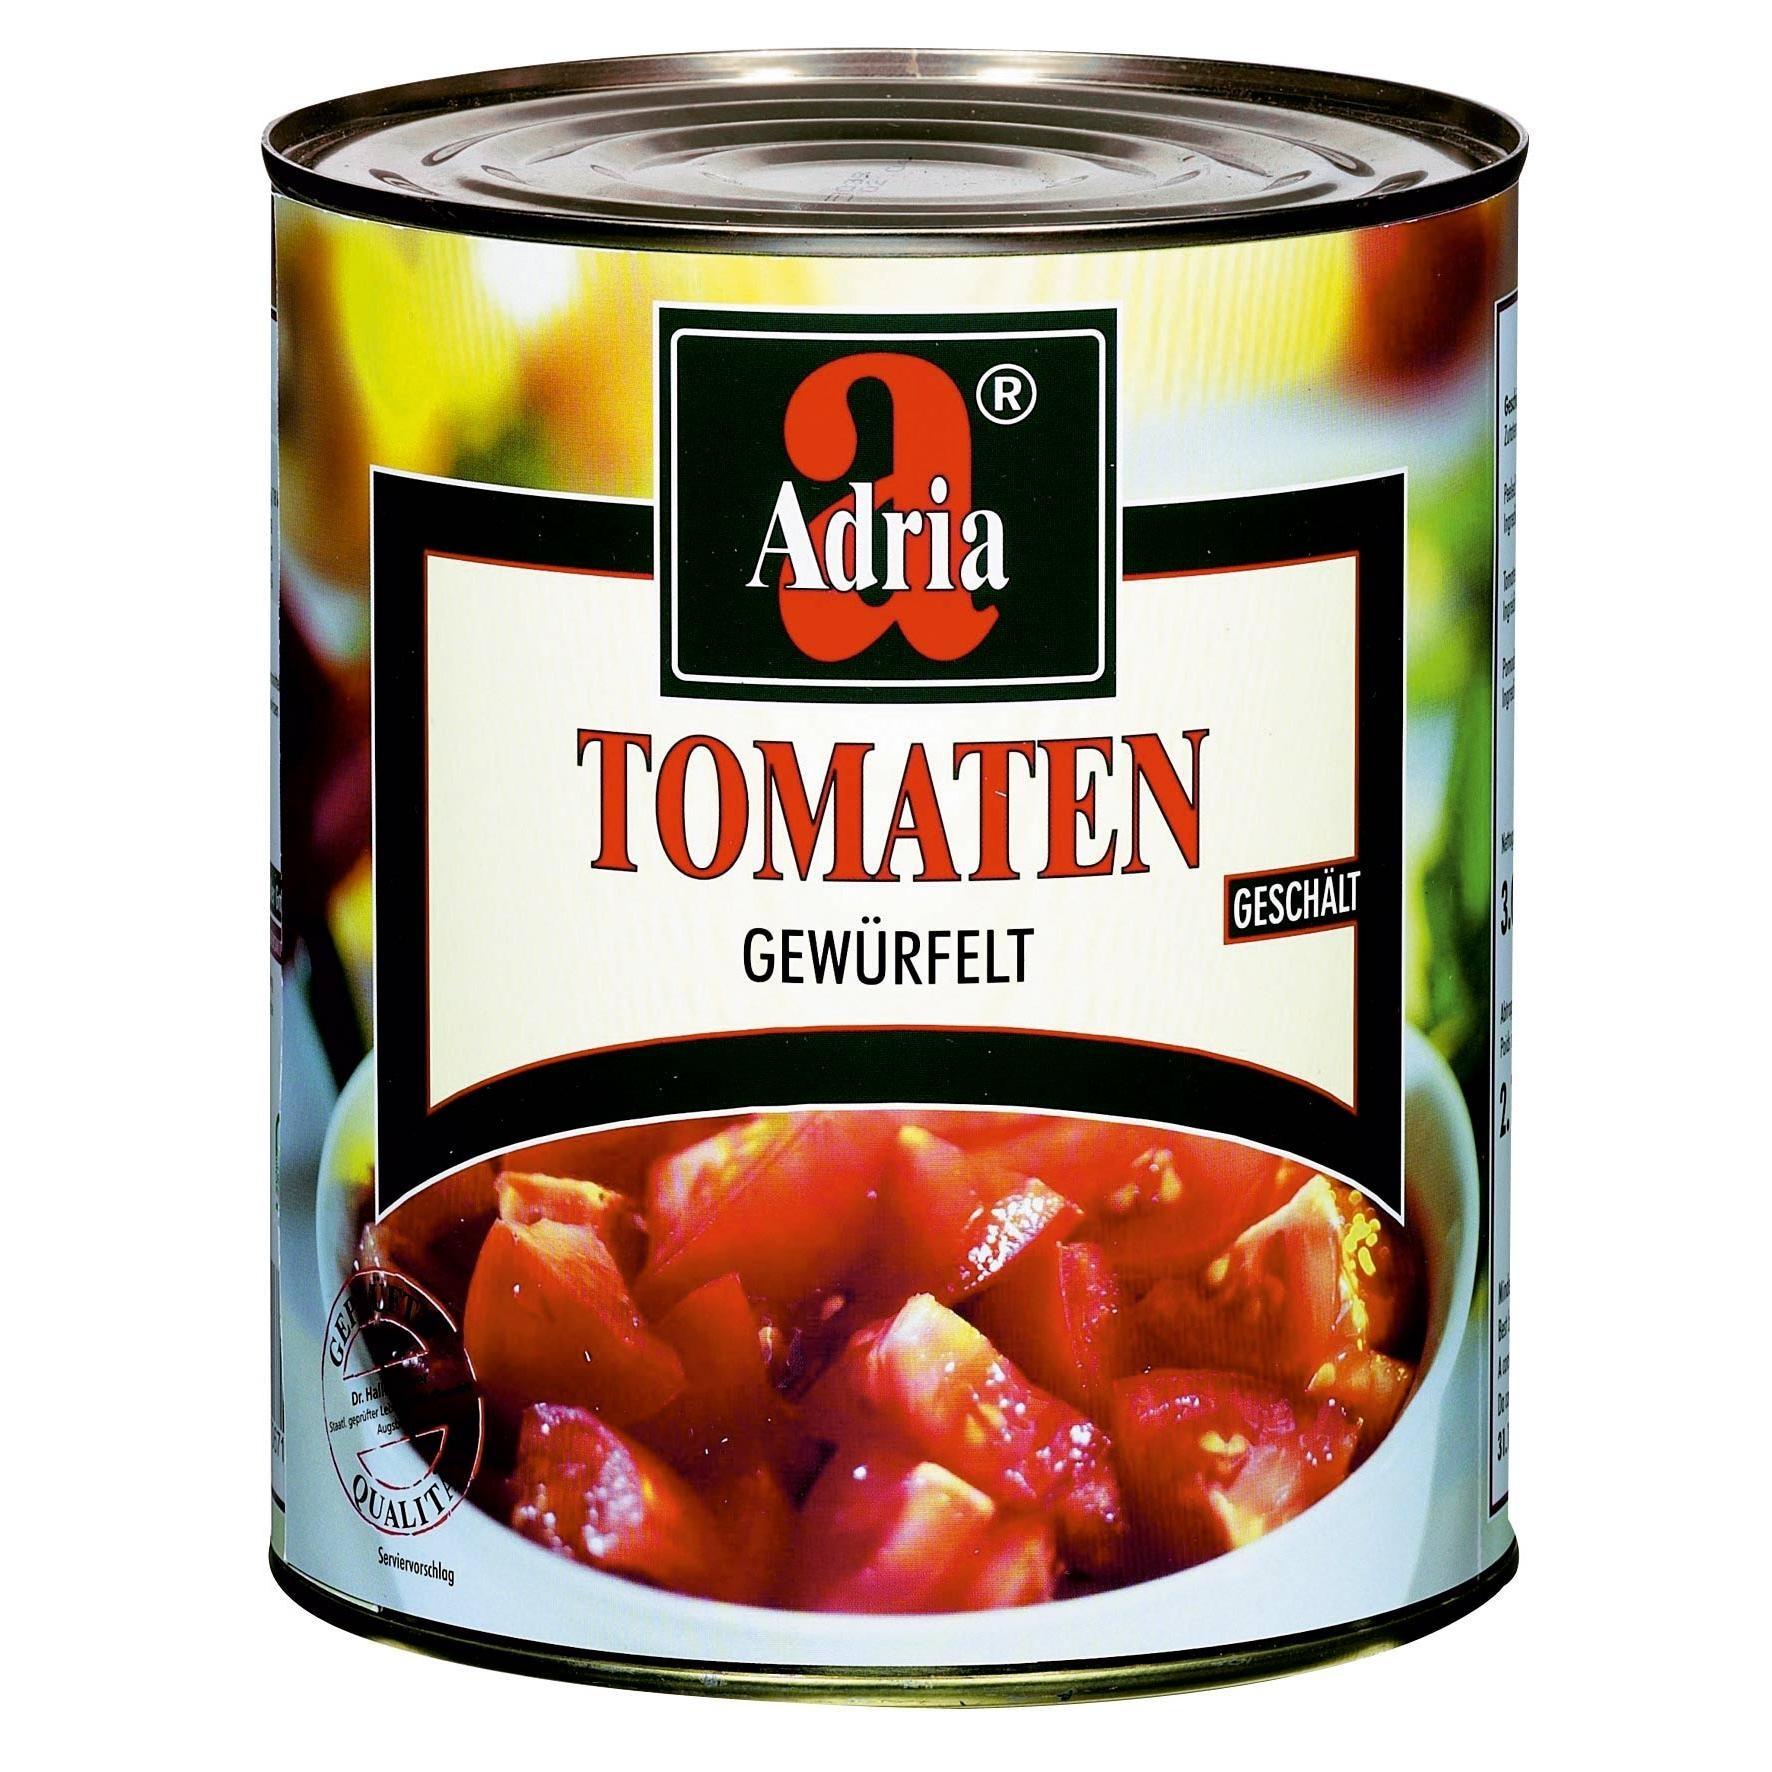 Adria Tomaten gewürfelt 2.2kg/3,1l